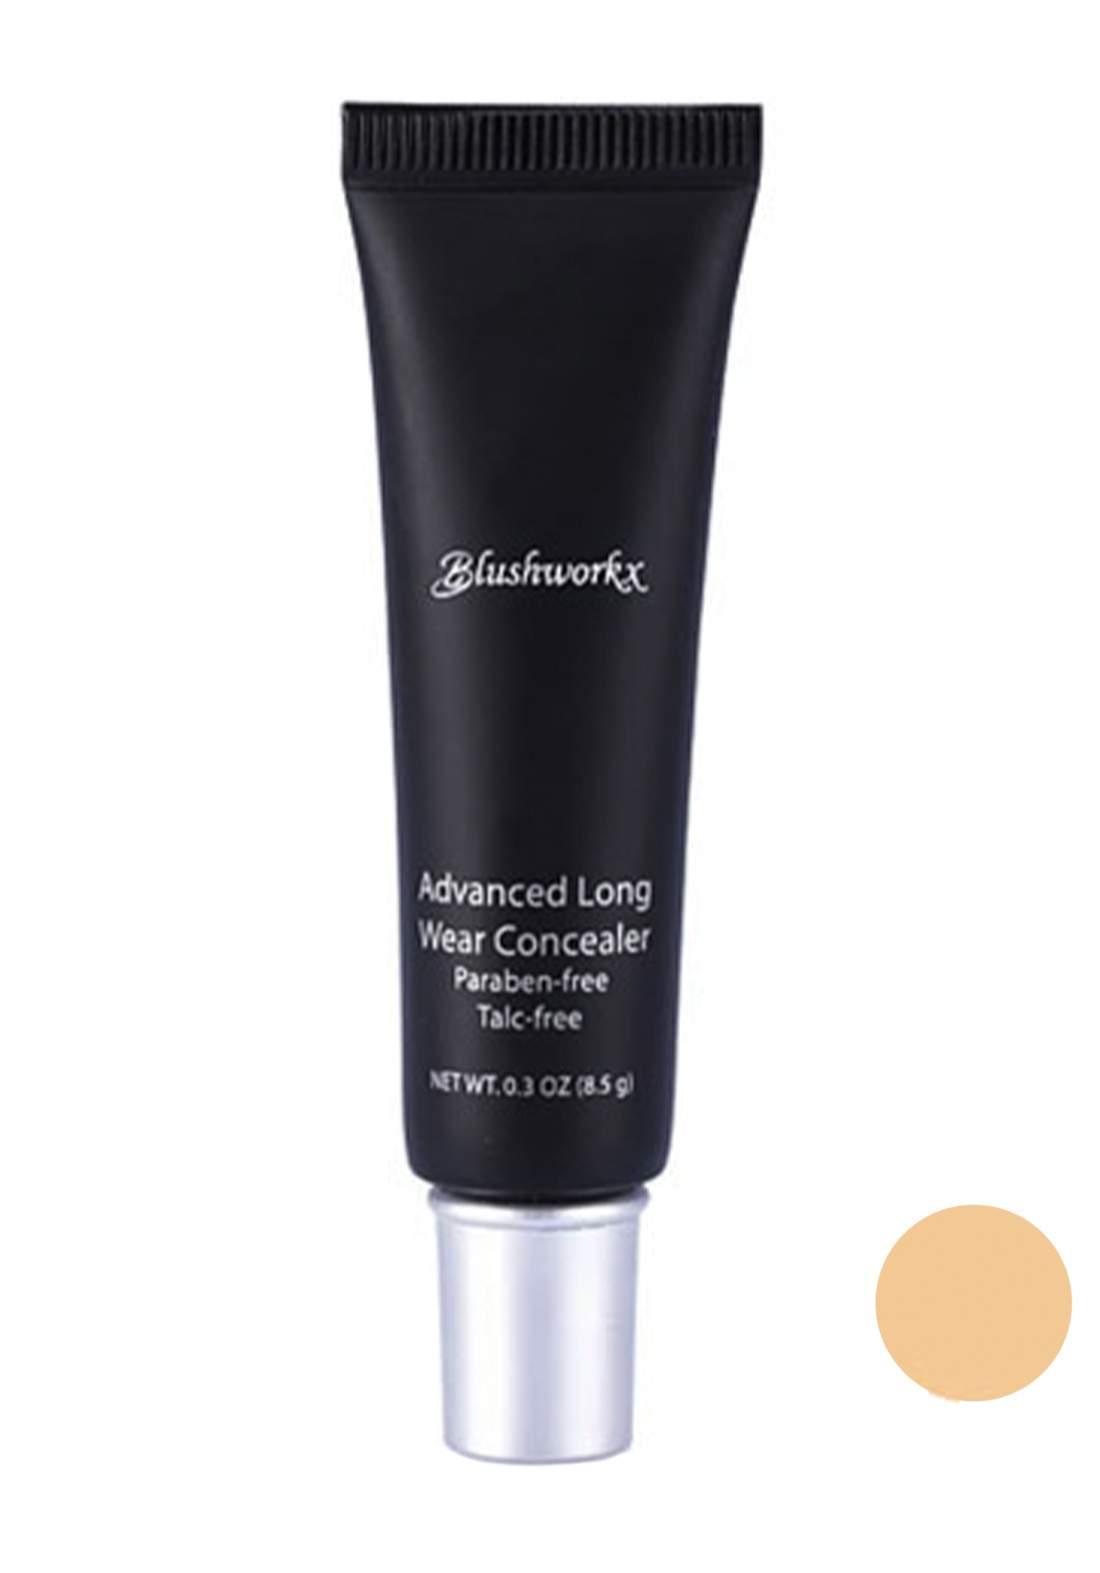 Blushworkx Hollywood Advance Long Wear Concealer 8.5g Medium Light كونسيلر